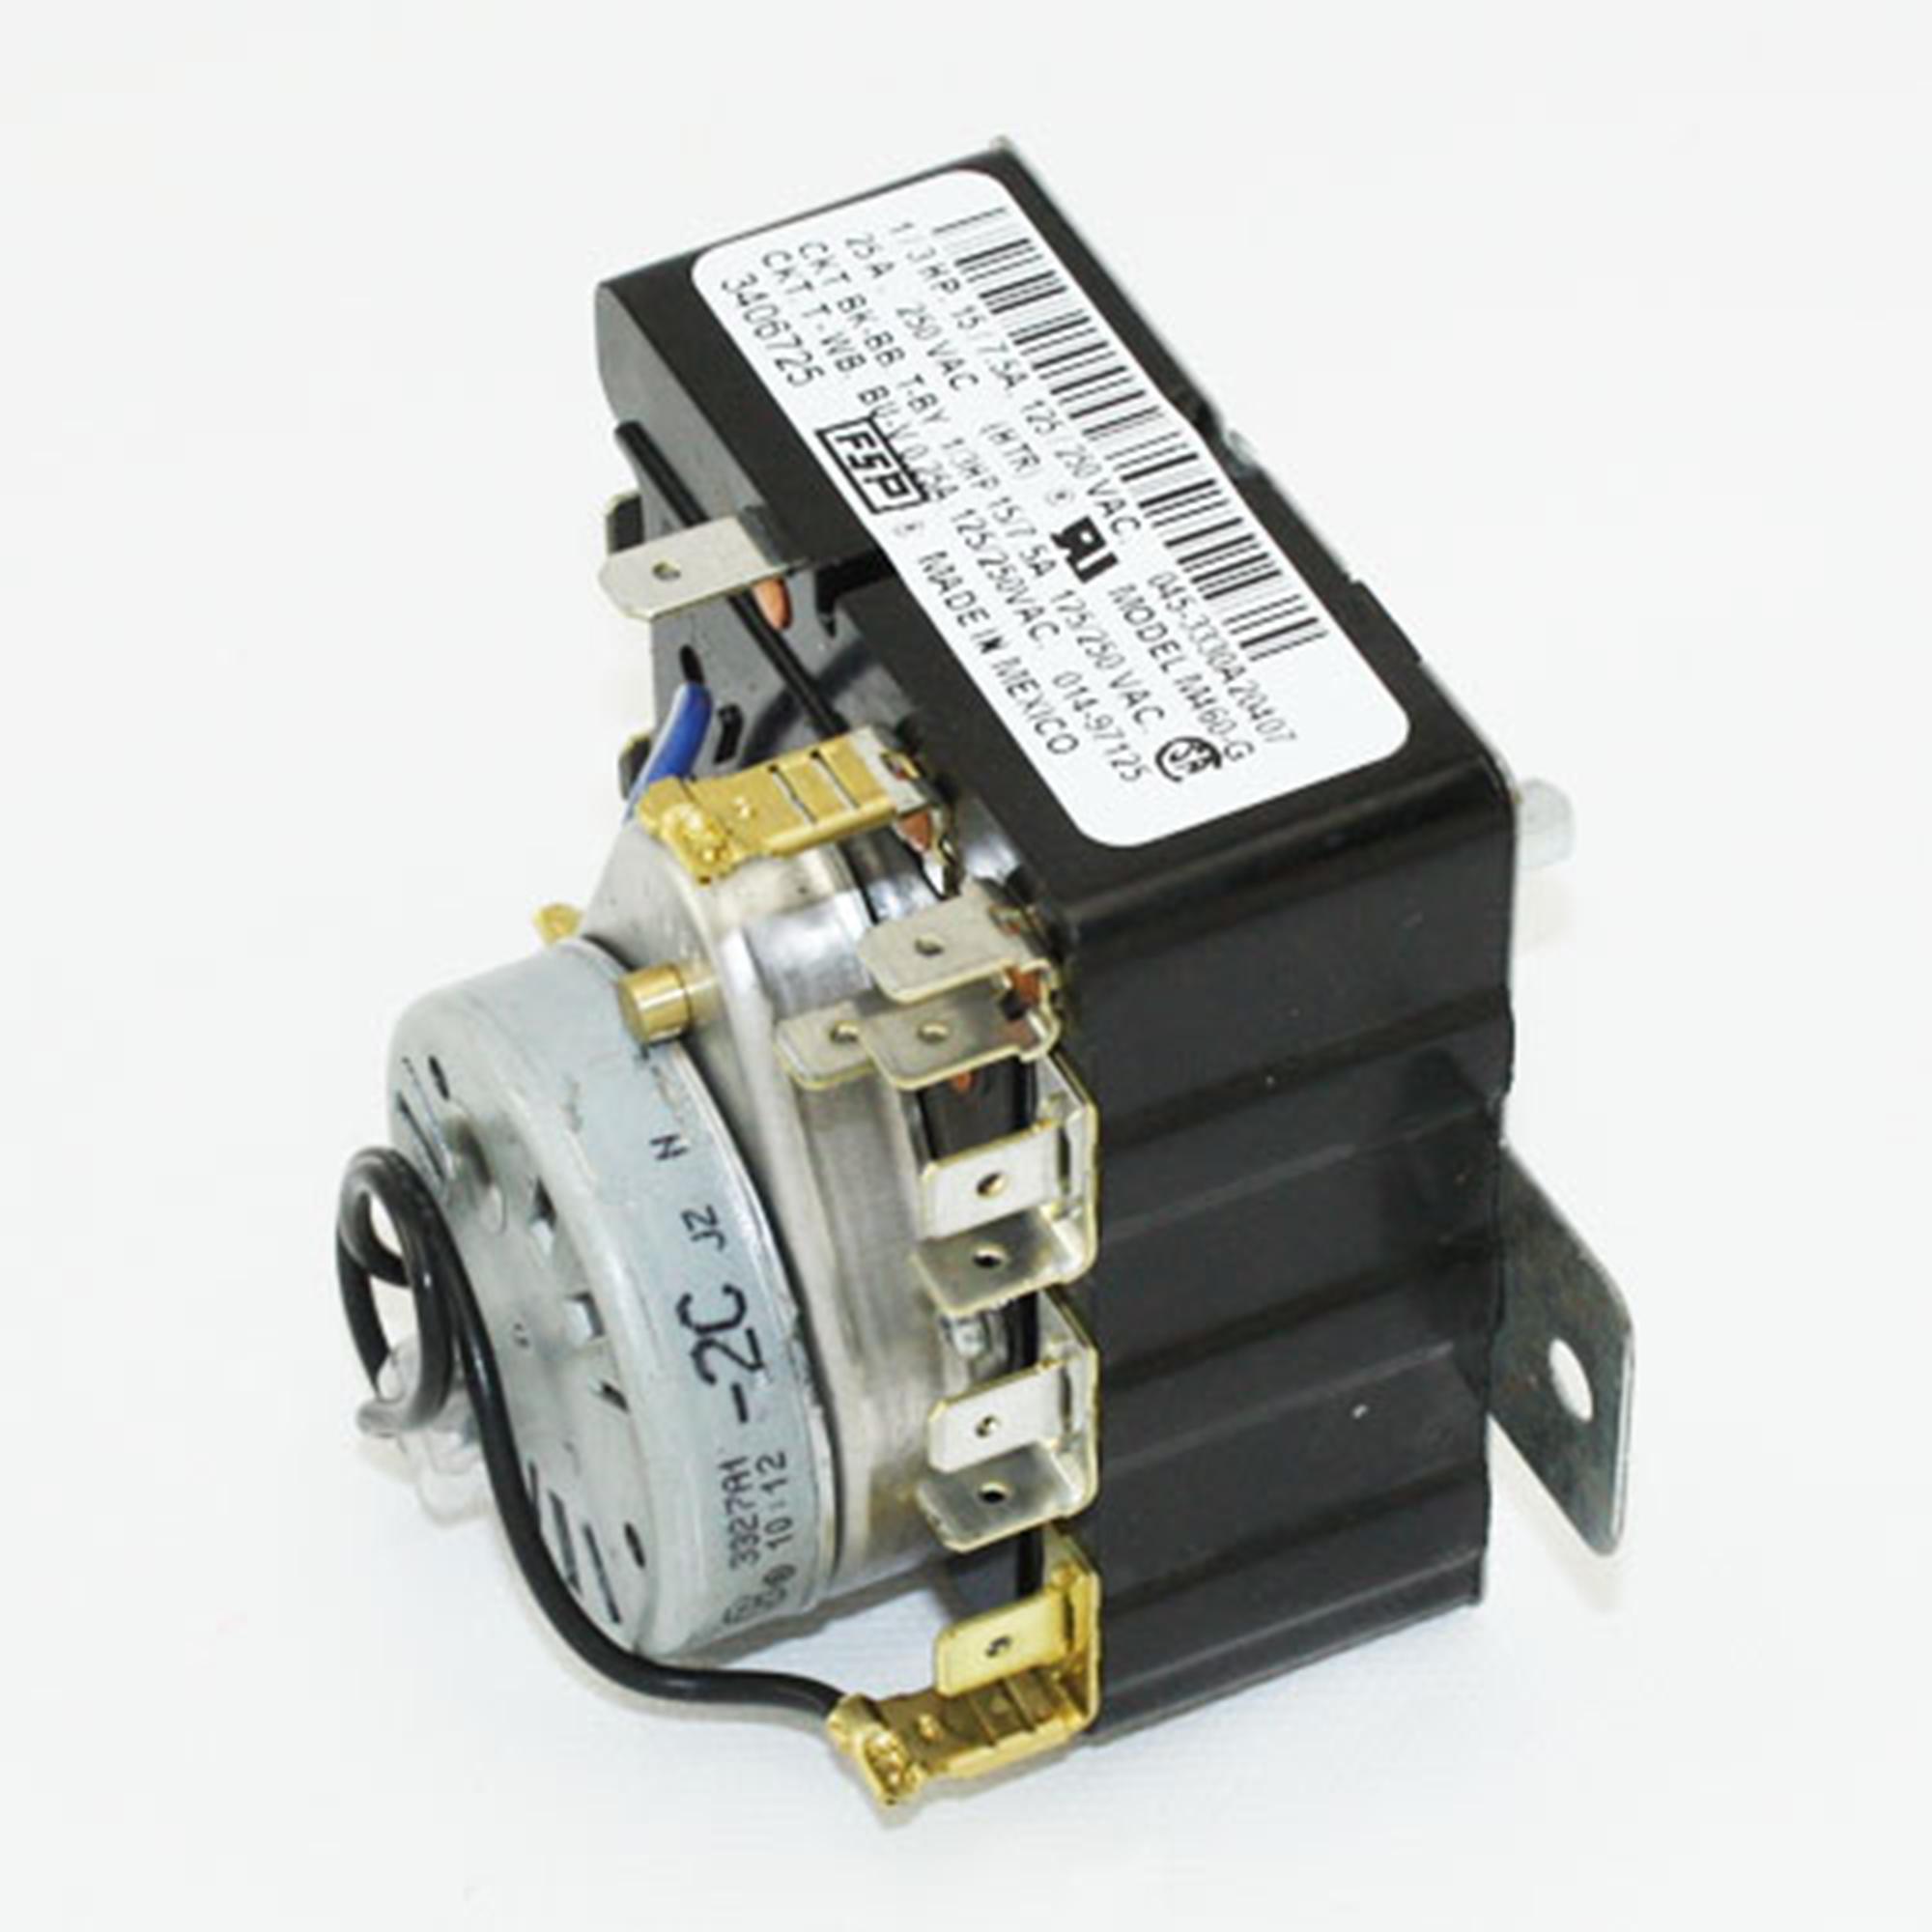 hight resolution of  maytag dryer timer wiring schematic diagram on dryer heating element wiring diagram dryer receptacle